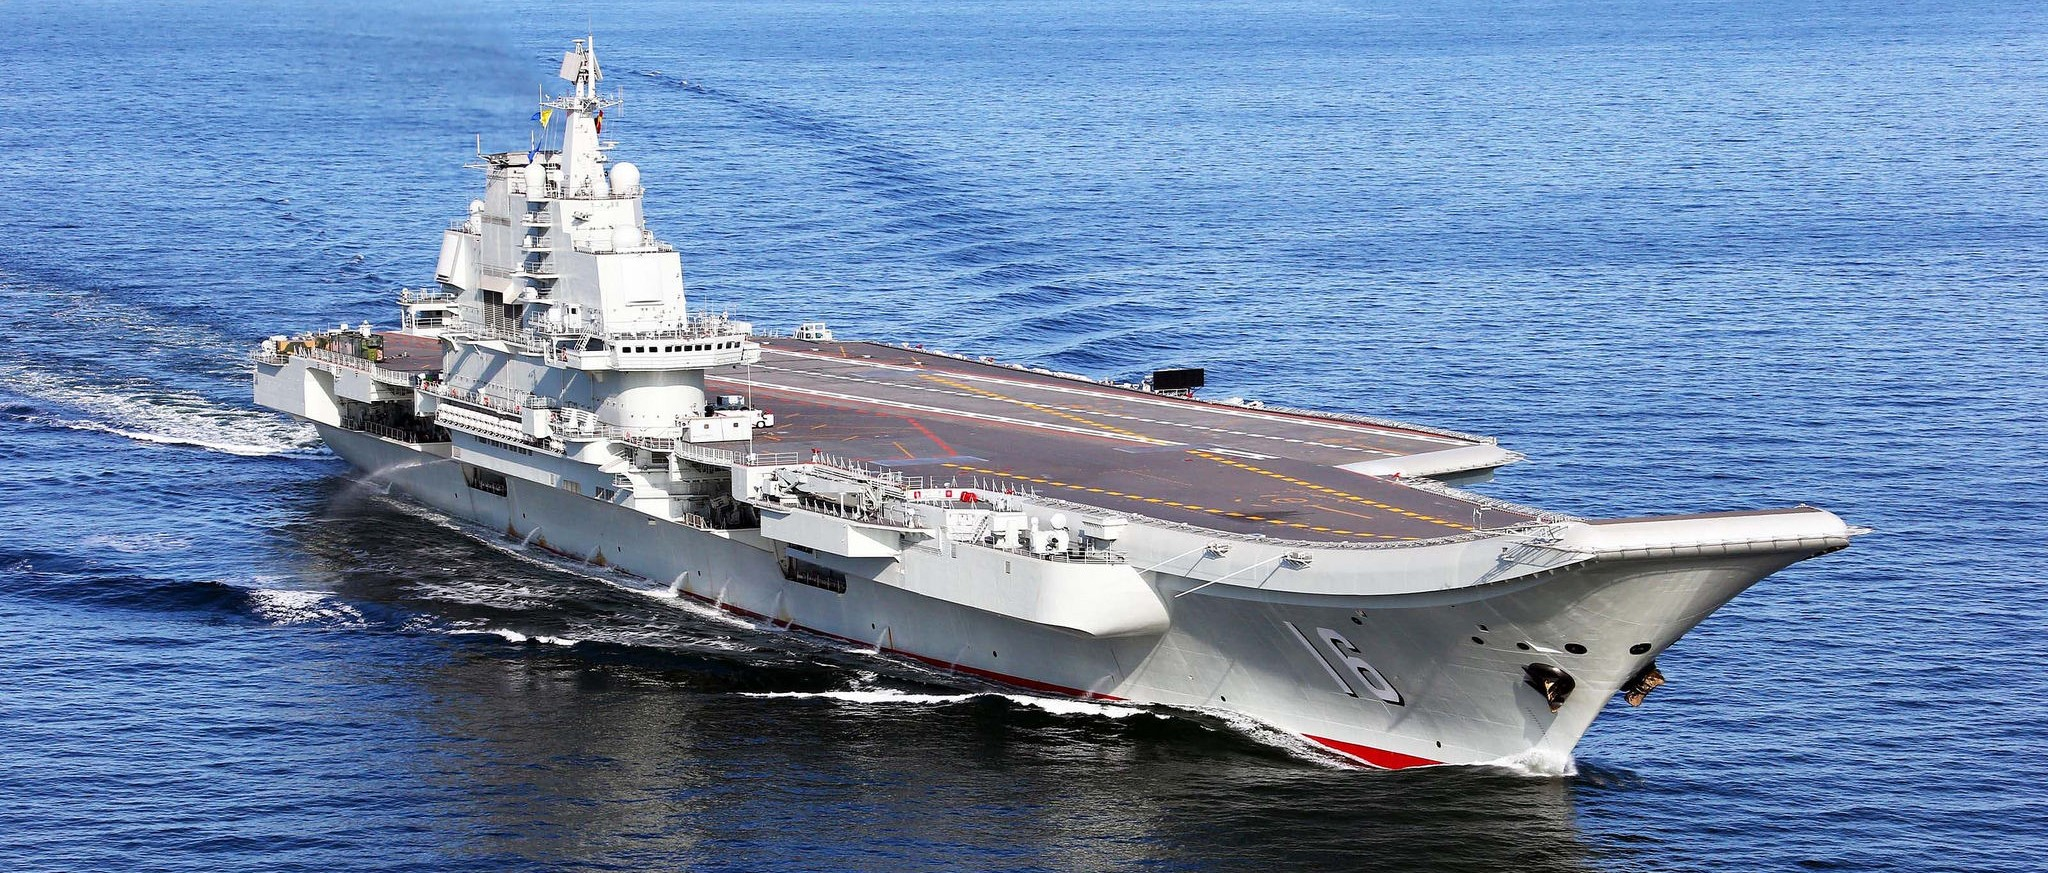 PLA Navy CV 16 (Photo: Flickr/Simon Yang)